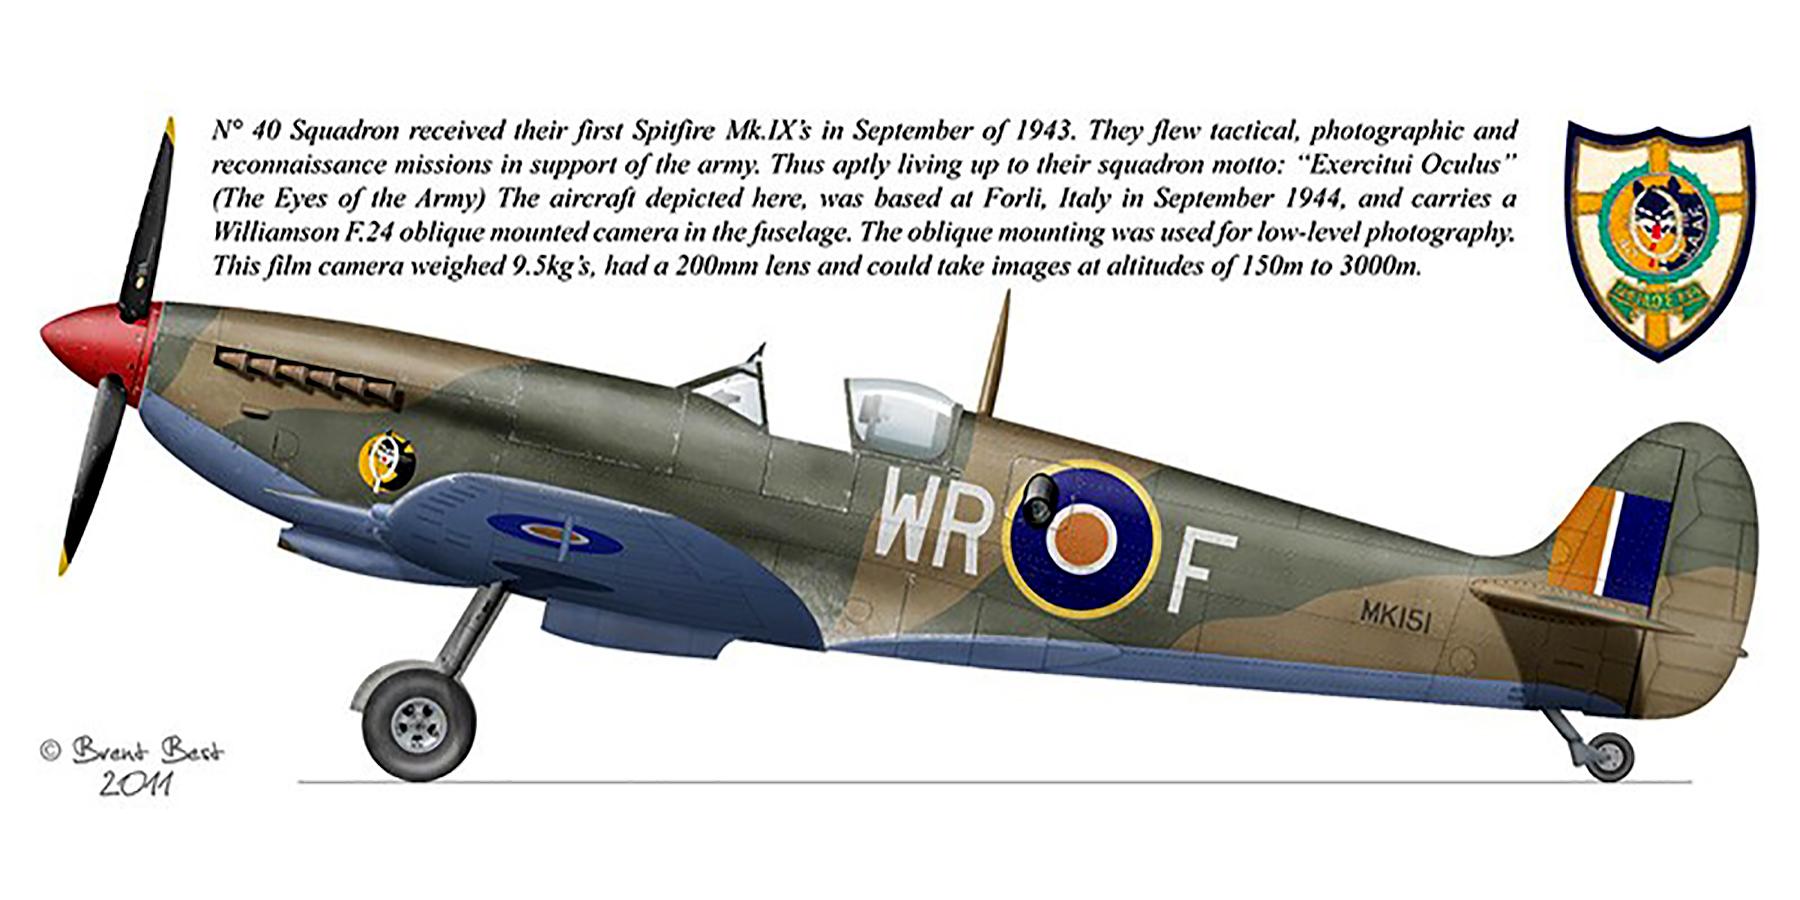 Spitfire LFIXc SAAF 40Sqn MK151 Italy 1943 0A